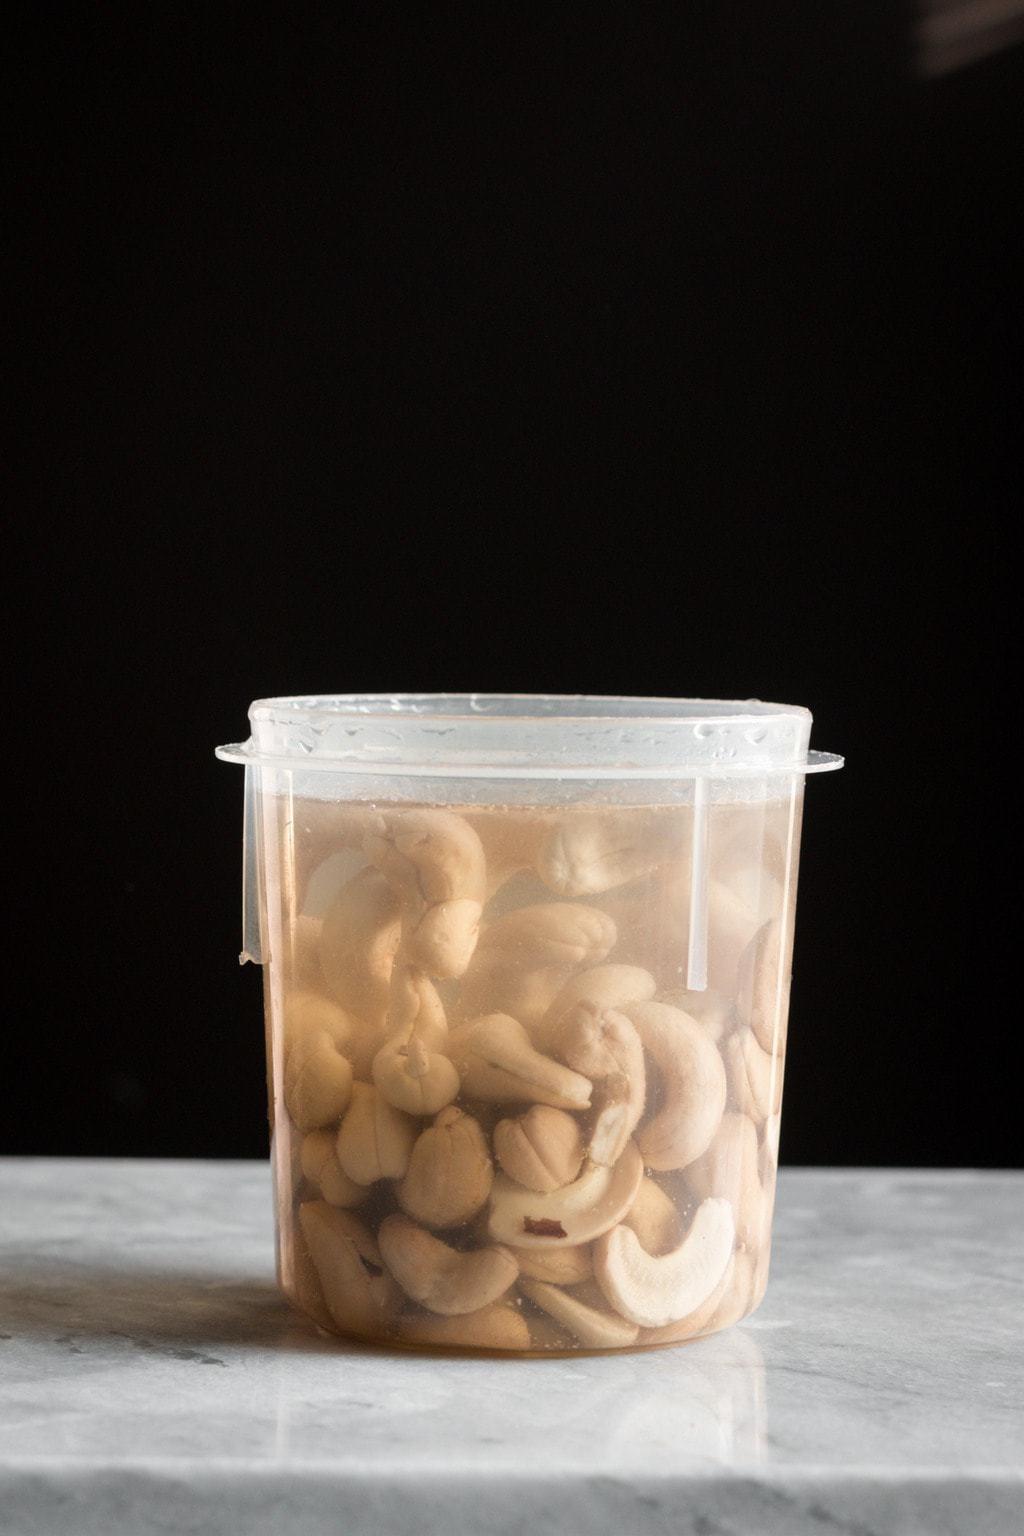 Vegan Cashew Eggnog (Sugar-Free)